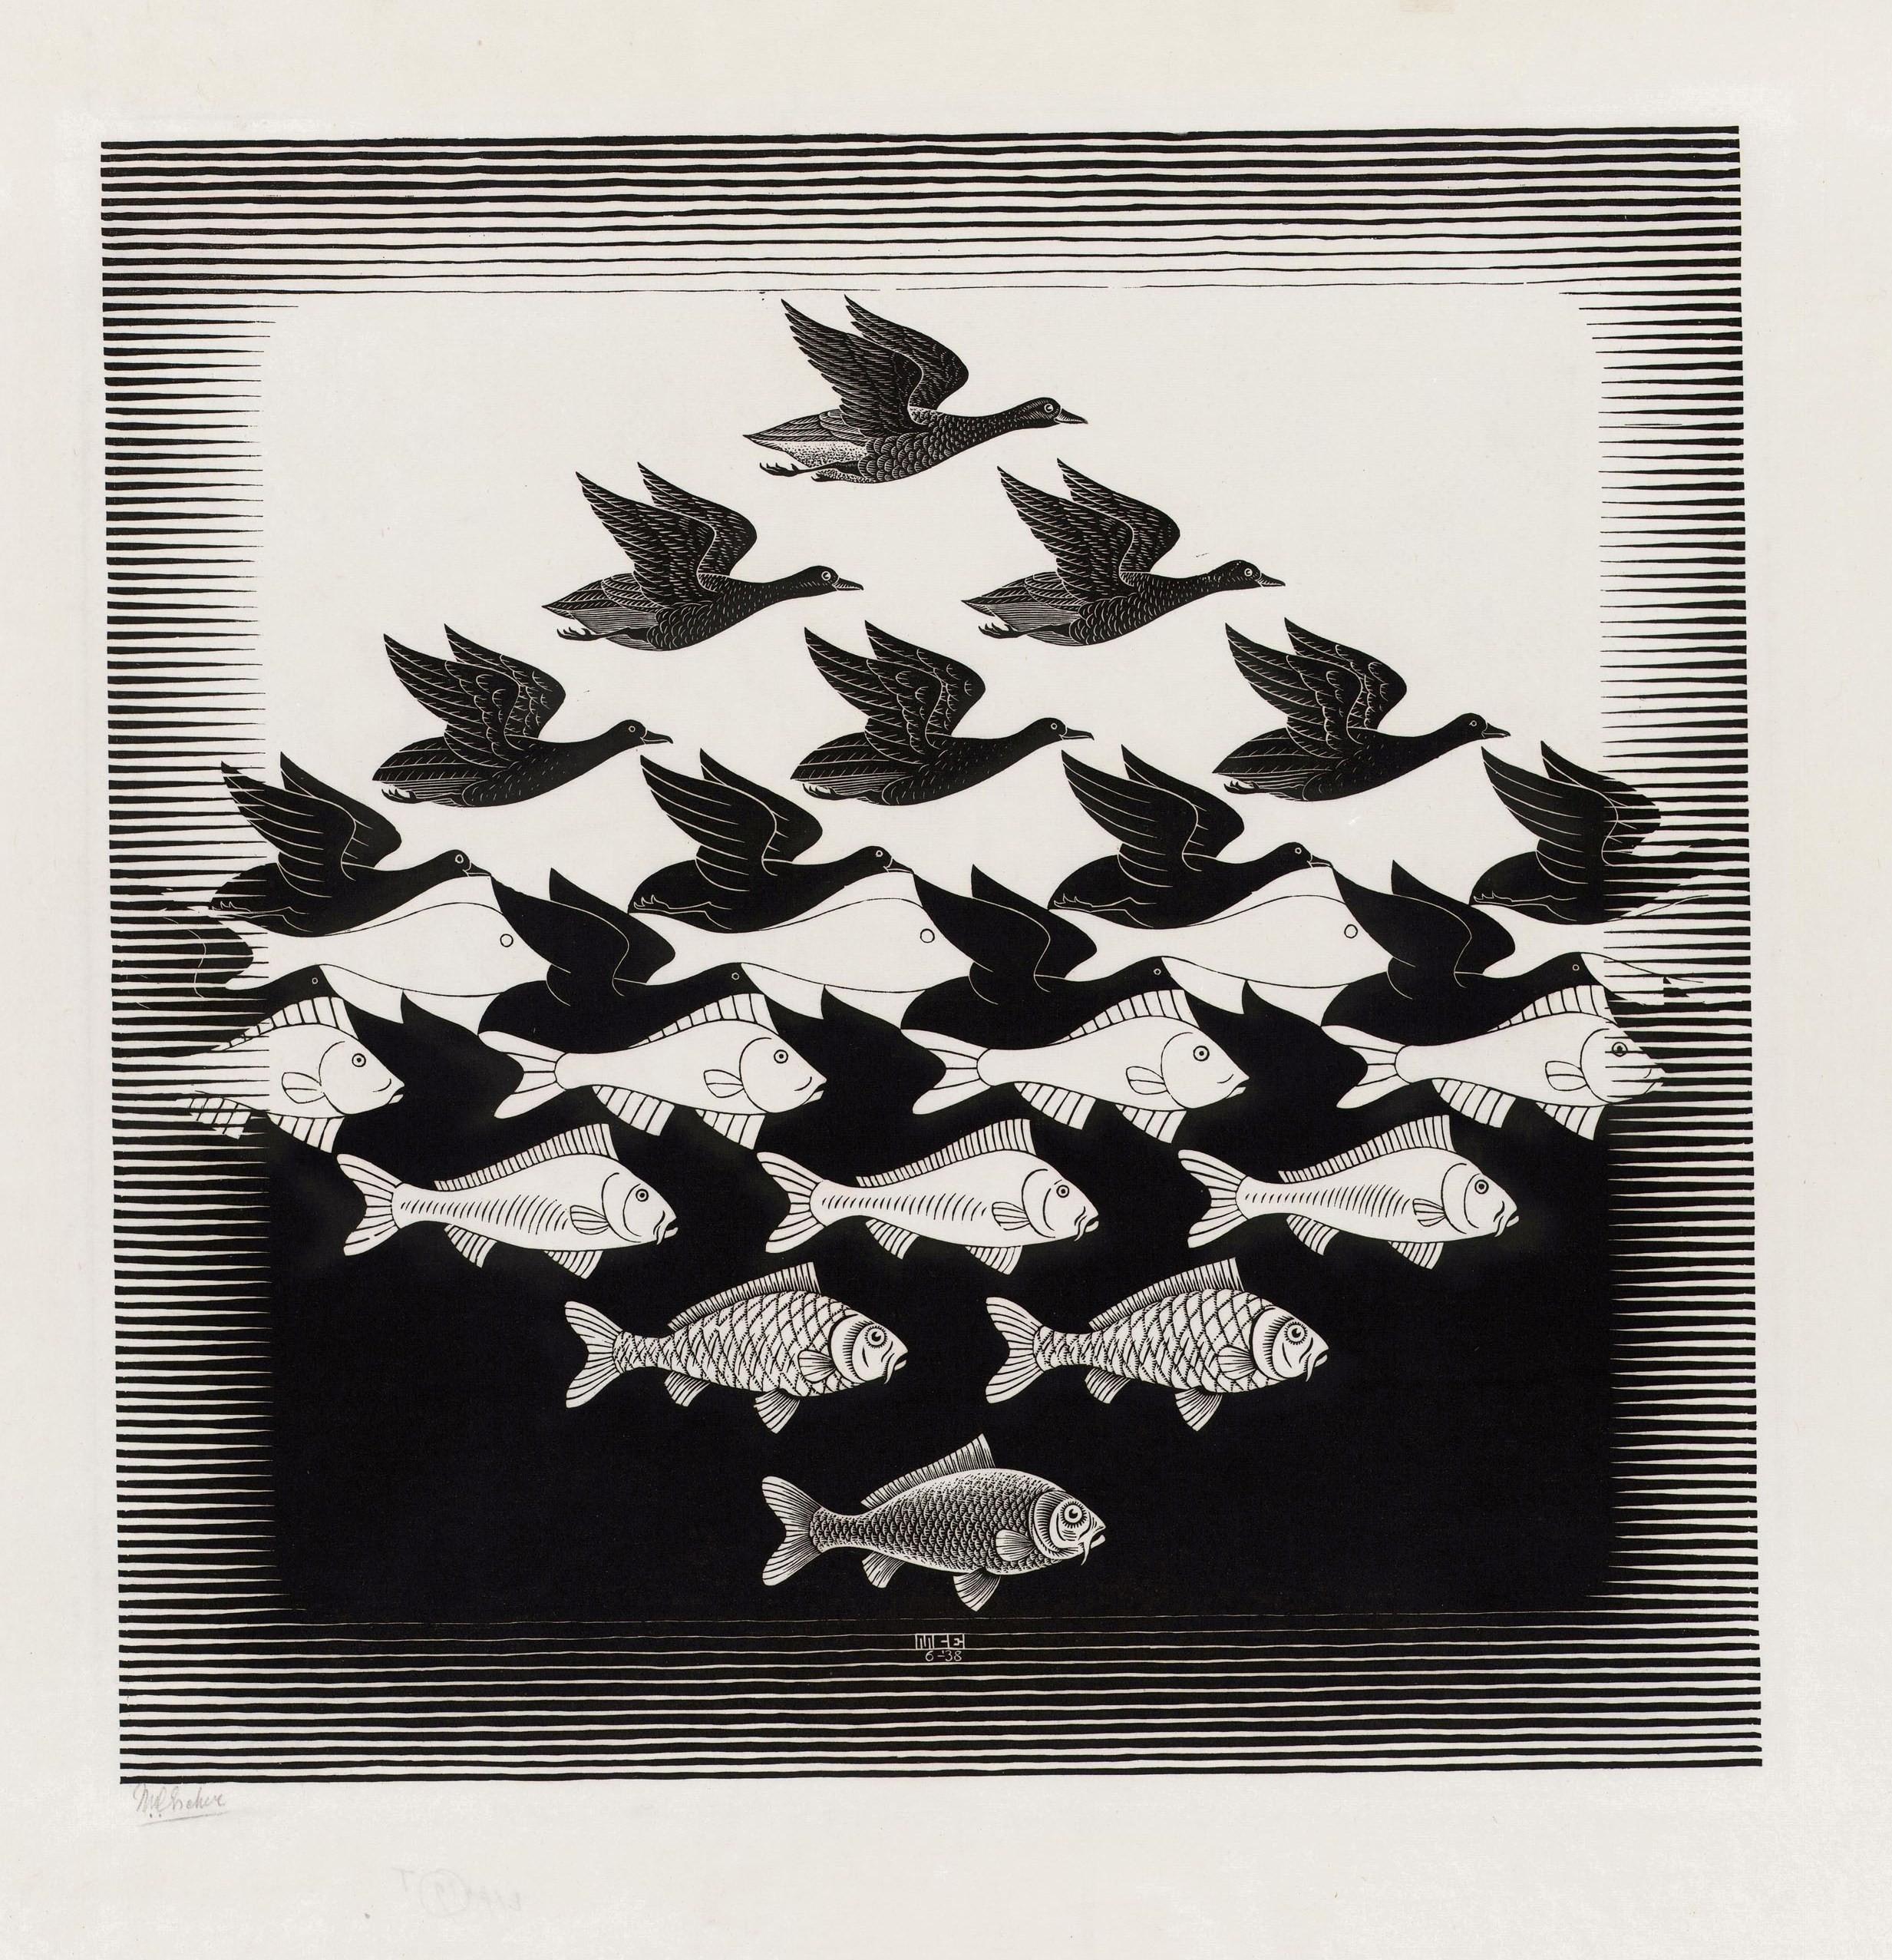 Drawn optical illusion wallpaper Animals illusion artwork M #drawing